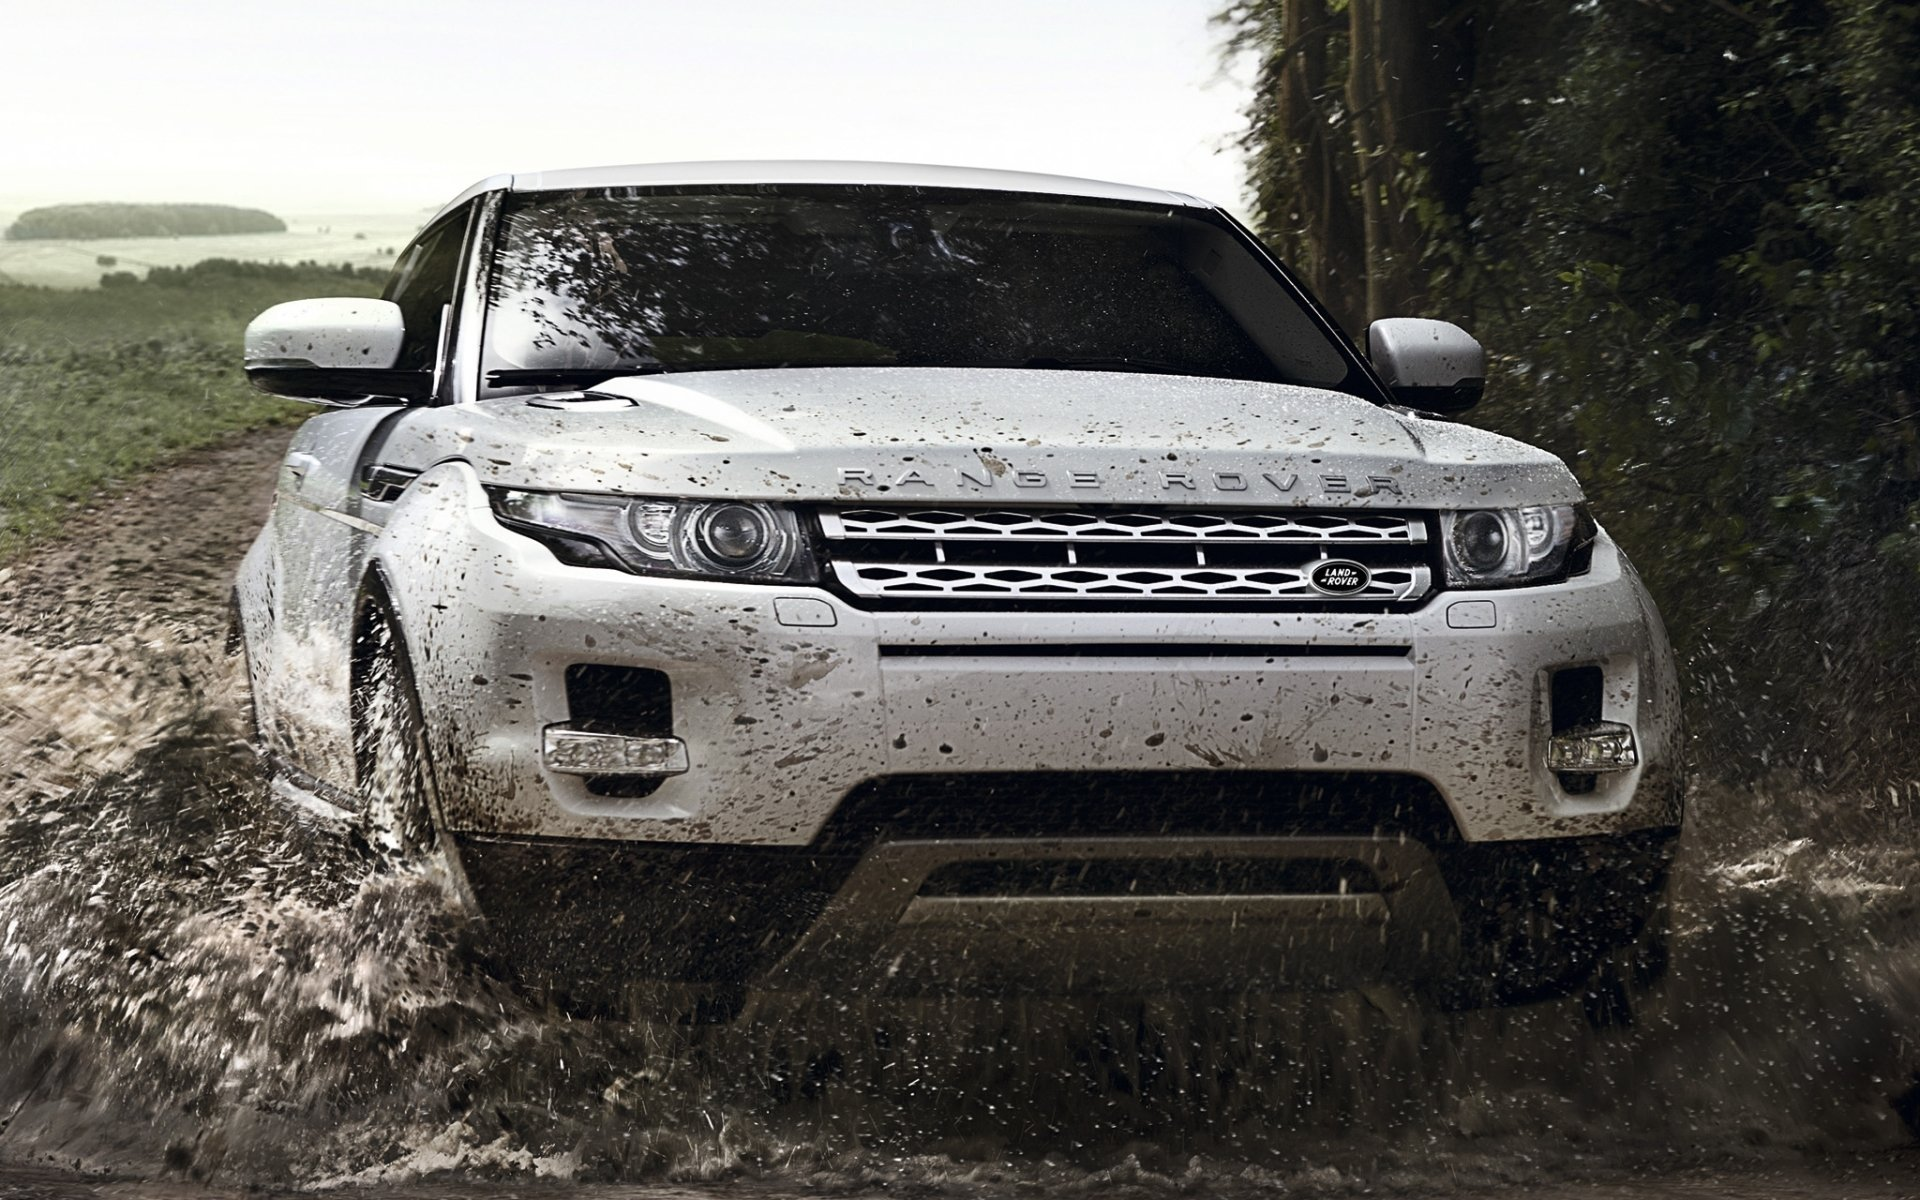 Range Rover Evoque Wallpapers Hd For Desktop Backgrounds